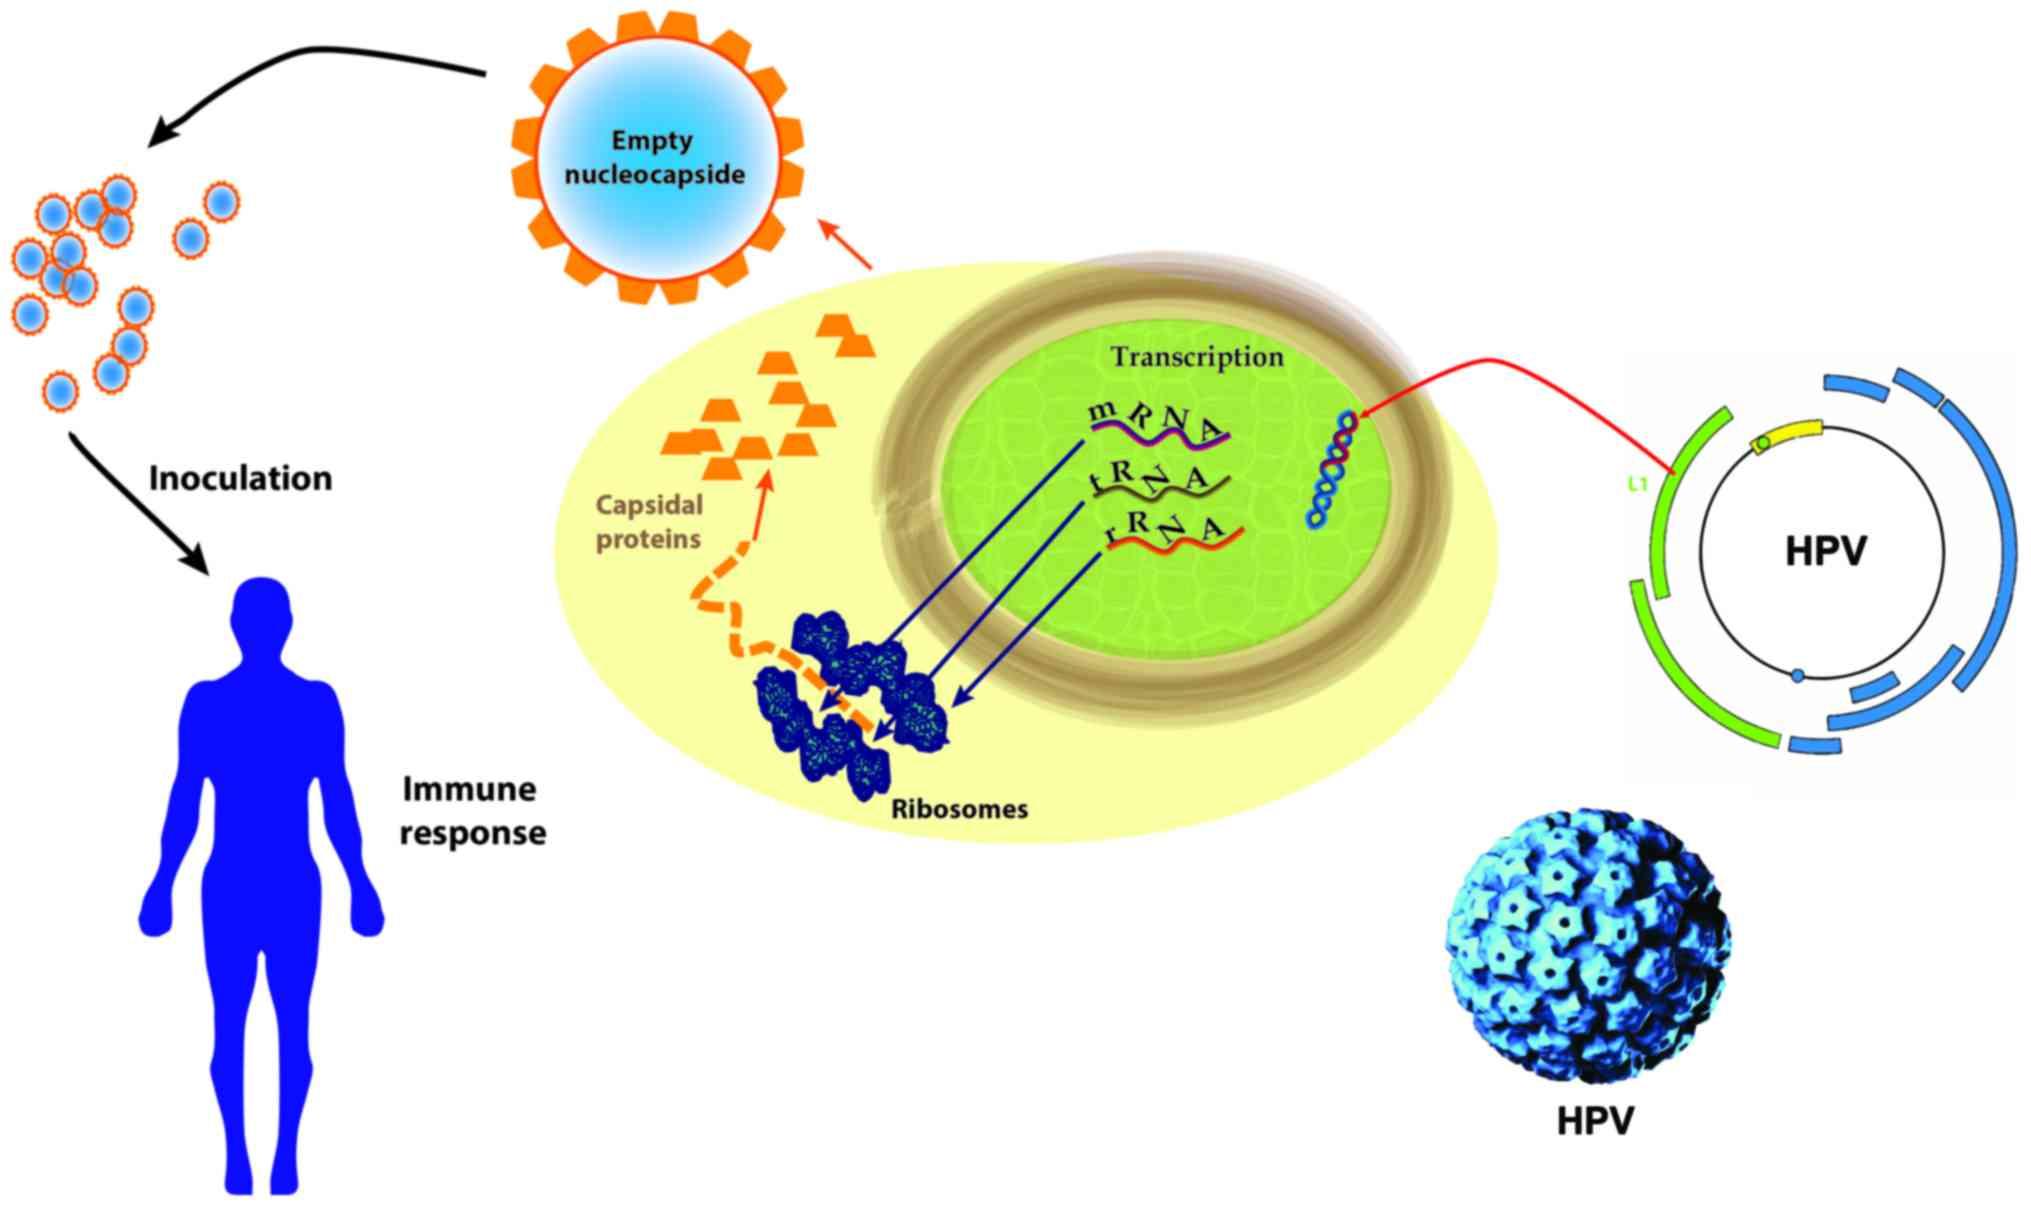 como quitar papiloma en la boca hpv virus in pap smear